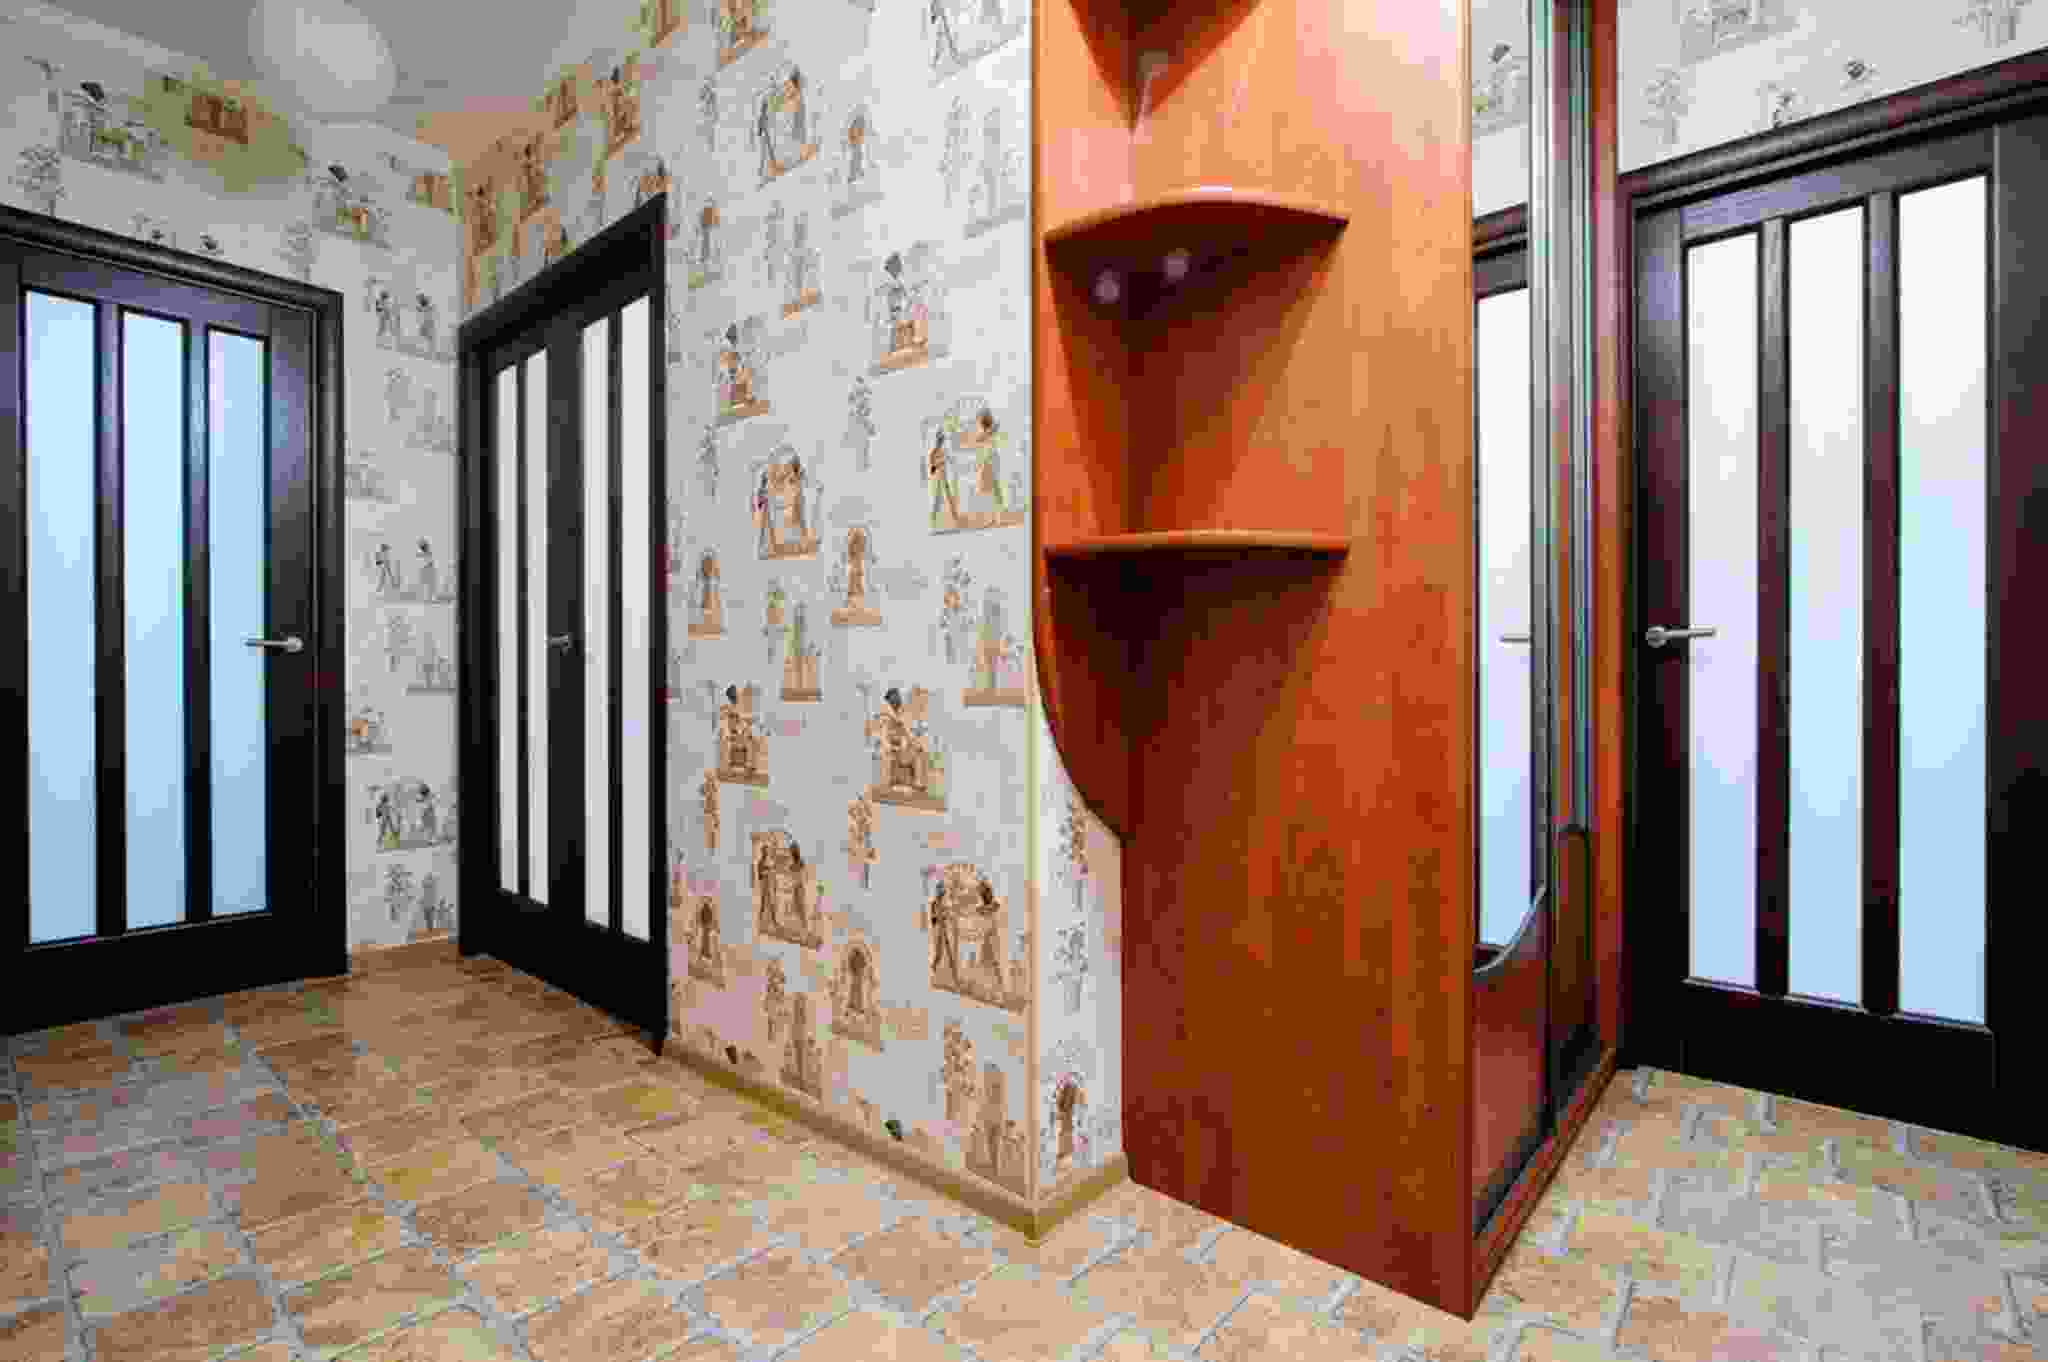 Апартаменты трёхкомнатные, (метро Парк Челюскинцев). Фото